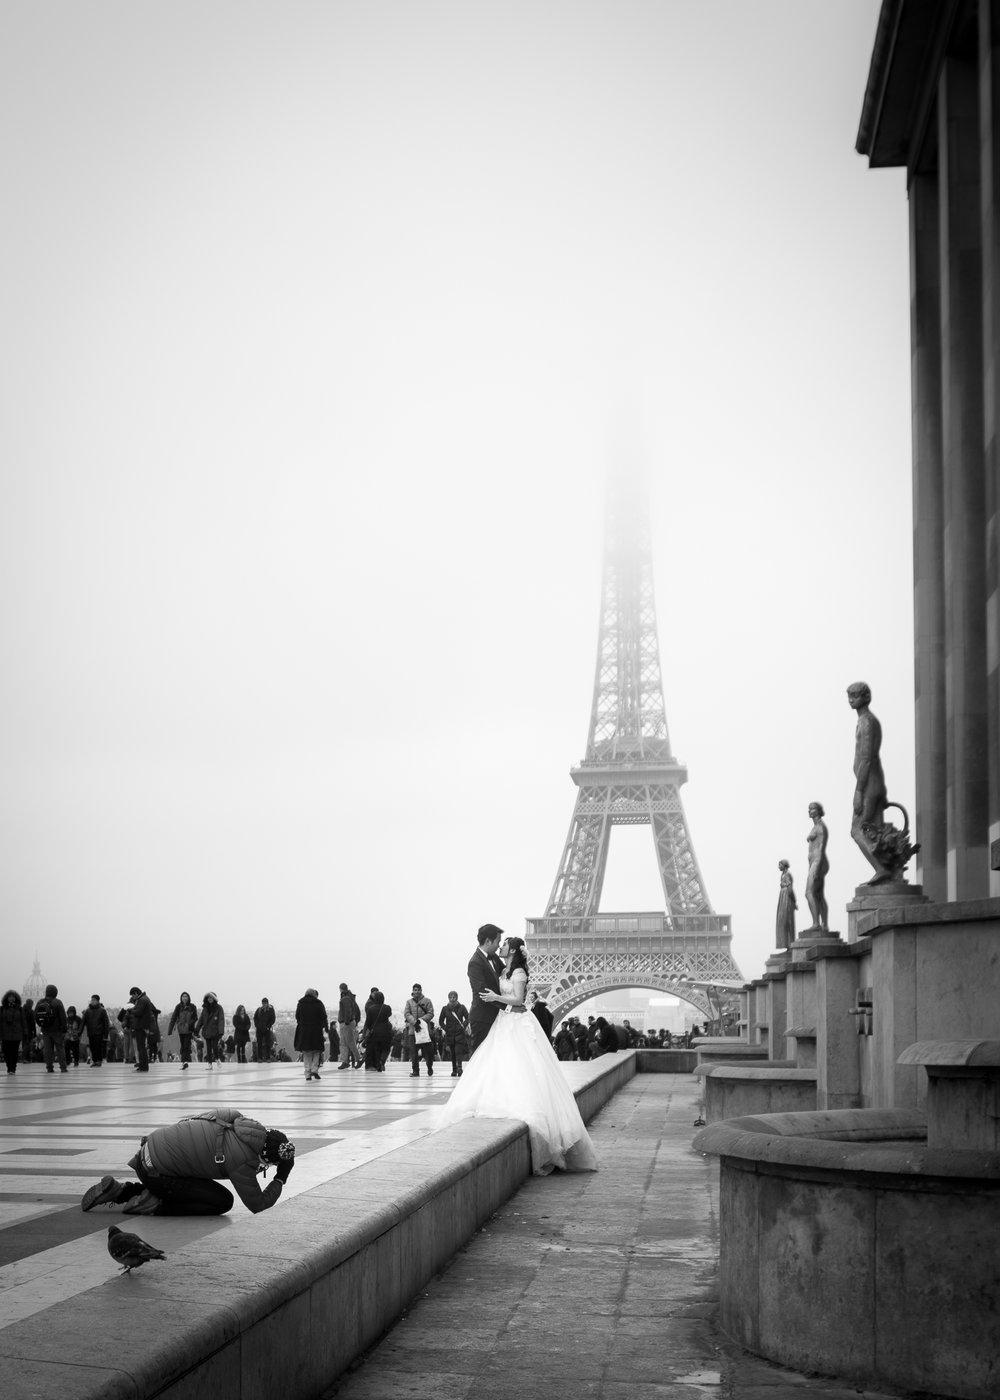 Place de Trocadéro